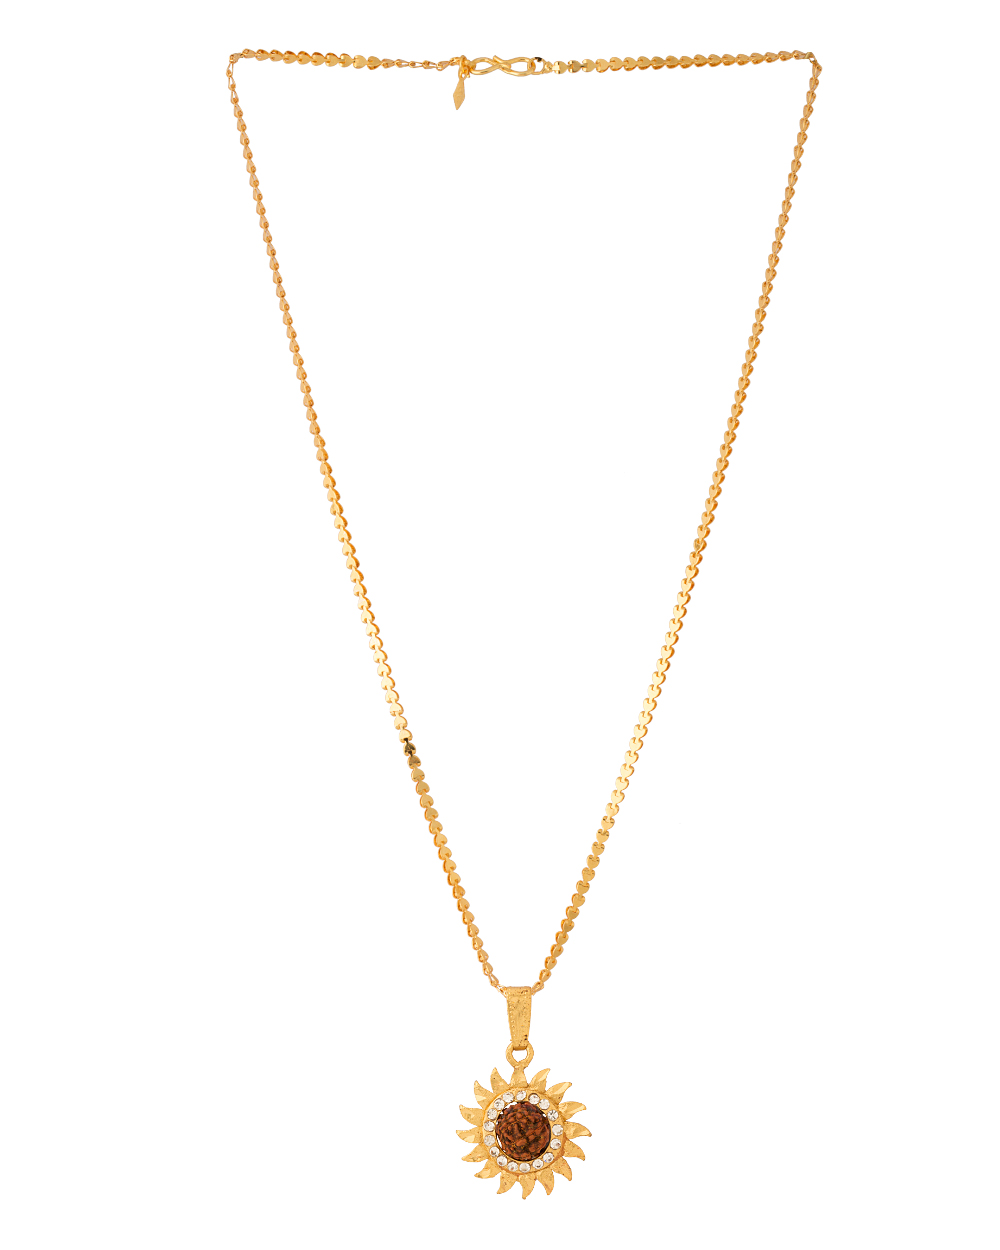 Buy Sun Design Pendant With Chain For Men Online India   Voylla